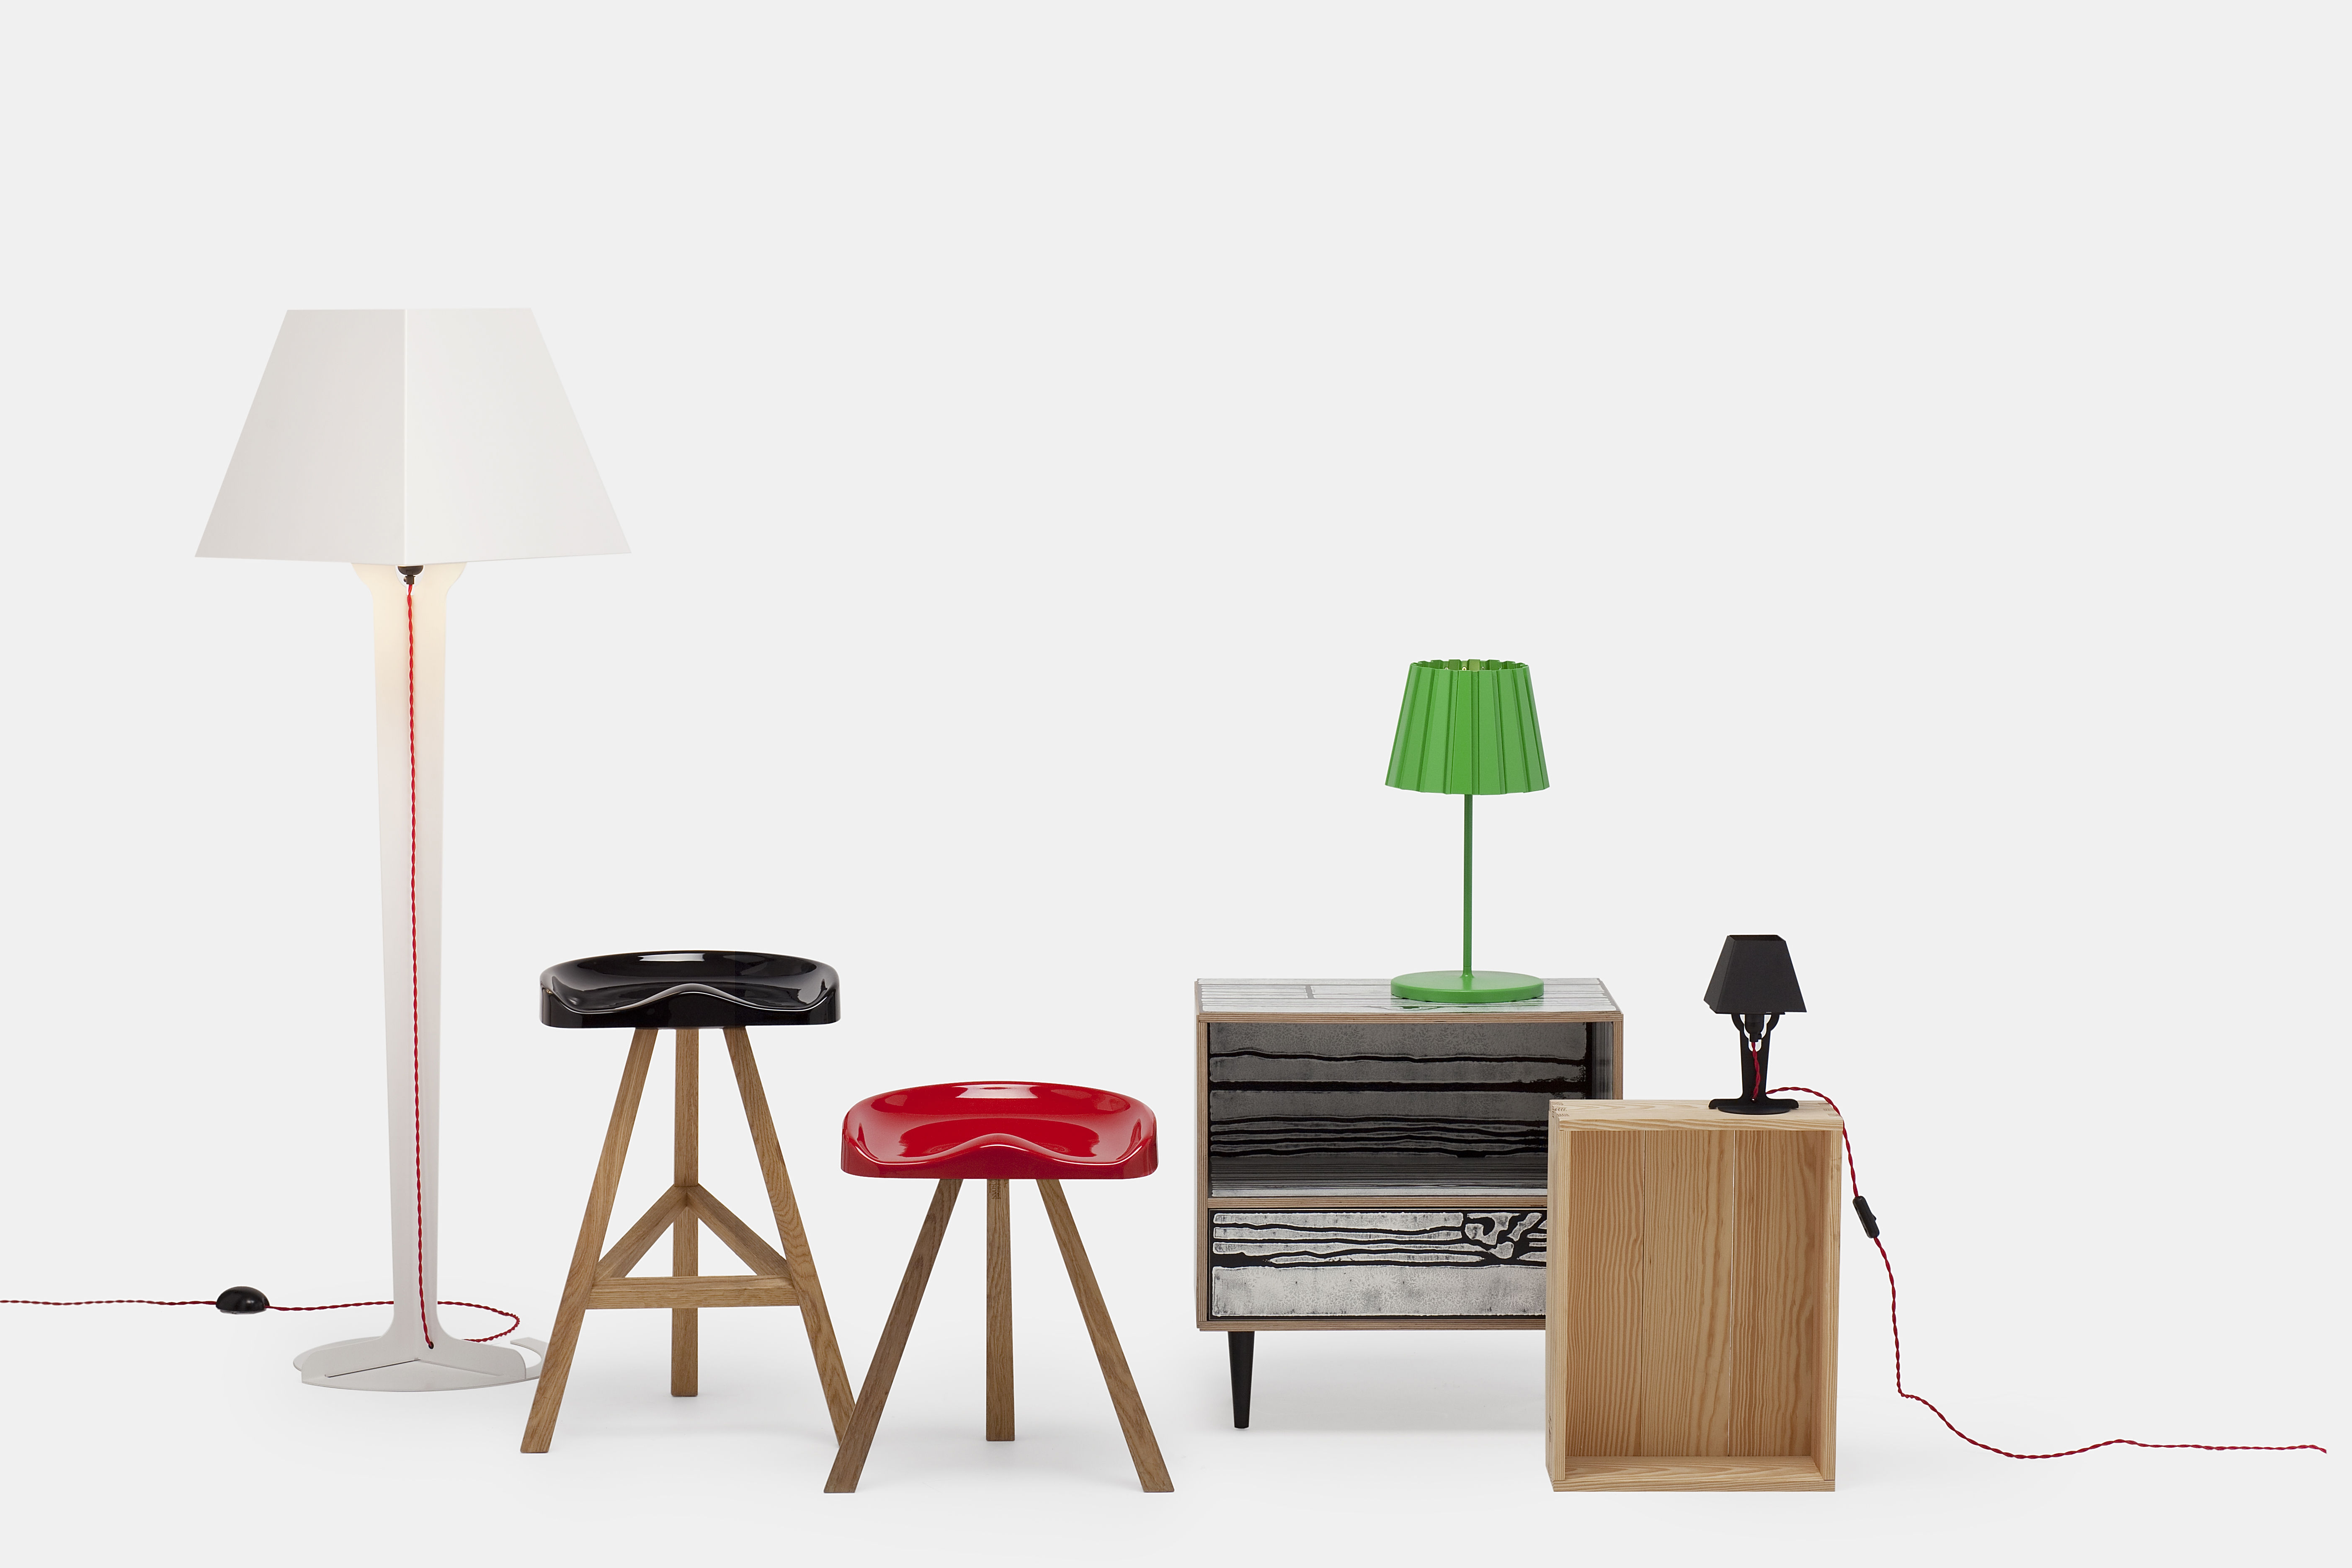 tabouret de bar heidi 80 cm plastique bois noir. Black Bedroom Furniture Sets. Home Design Ideas